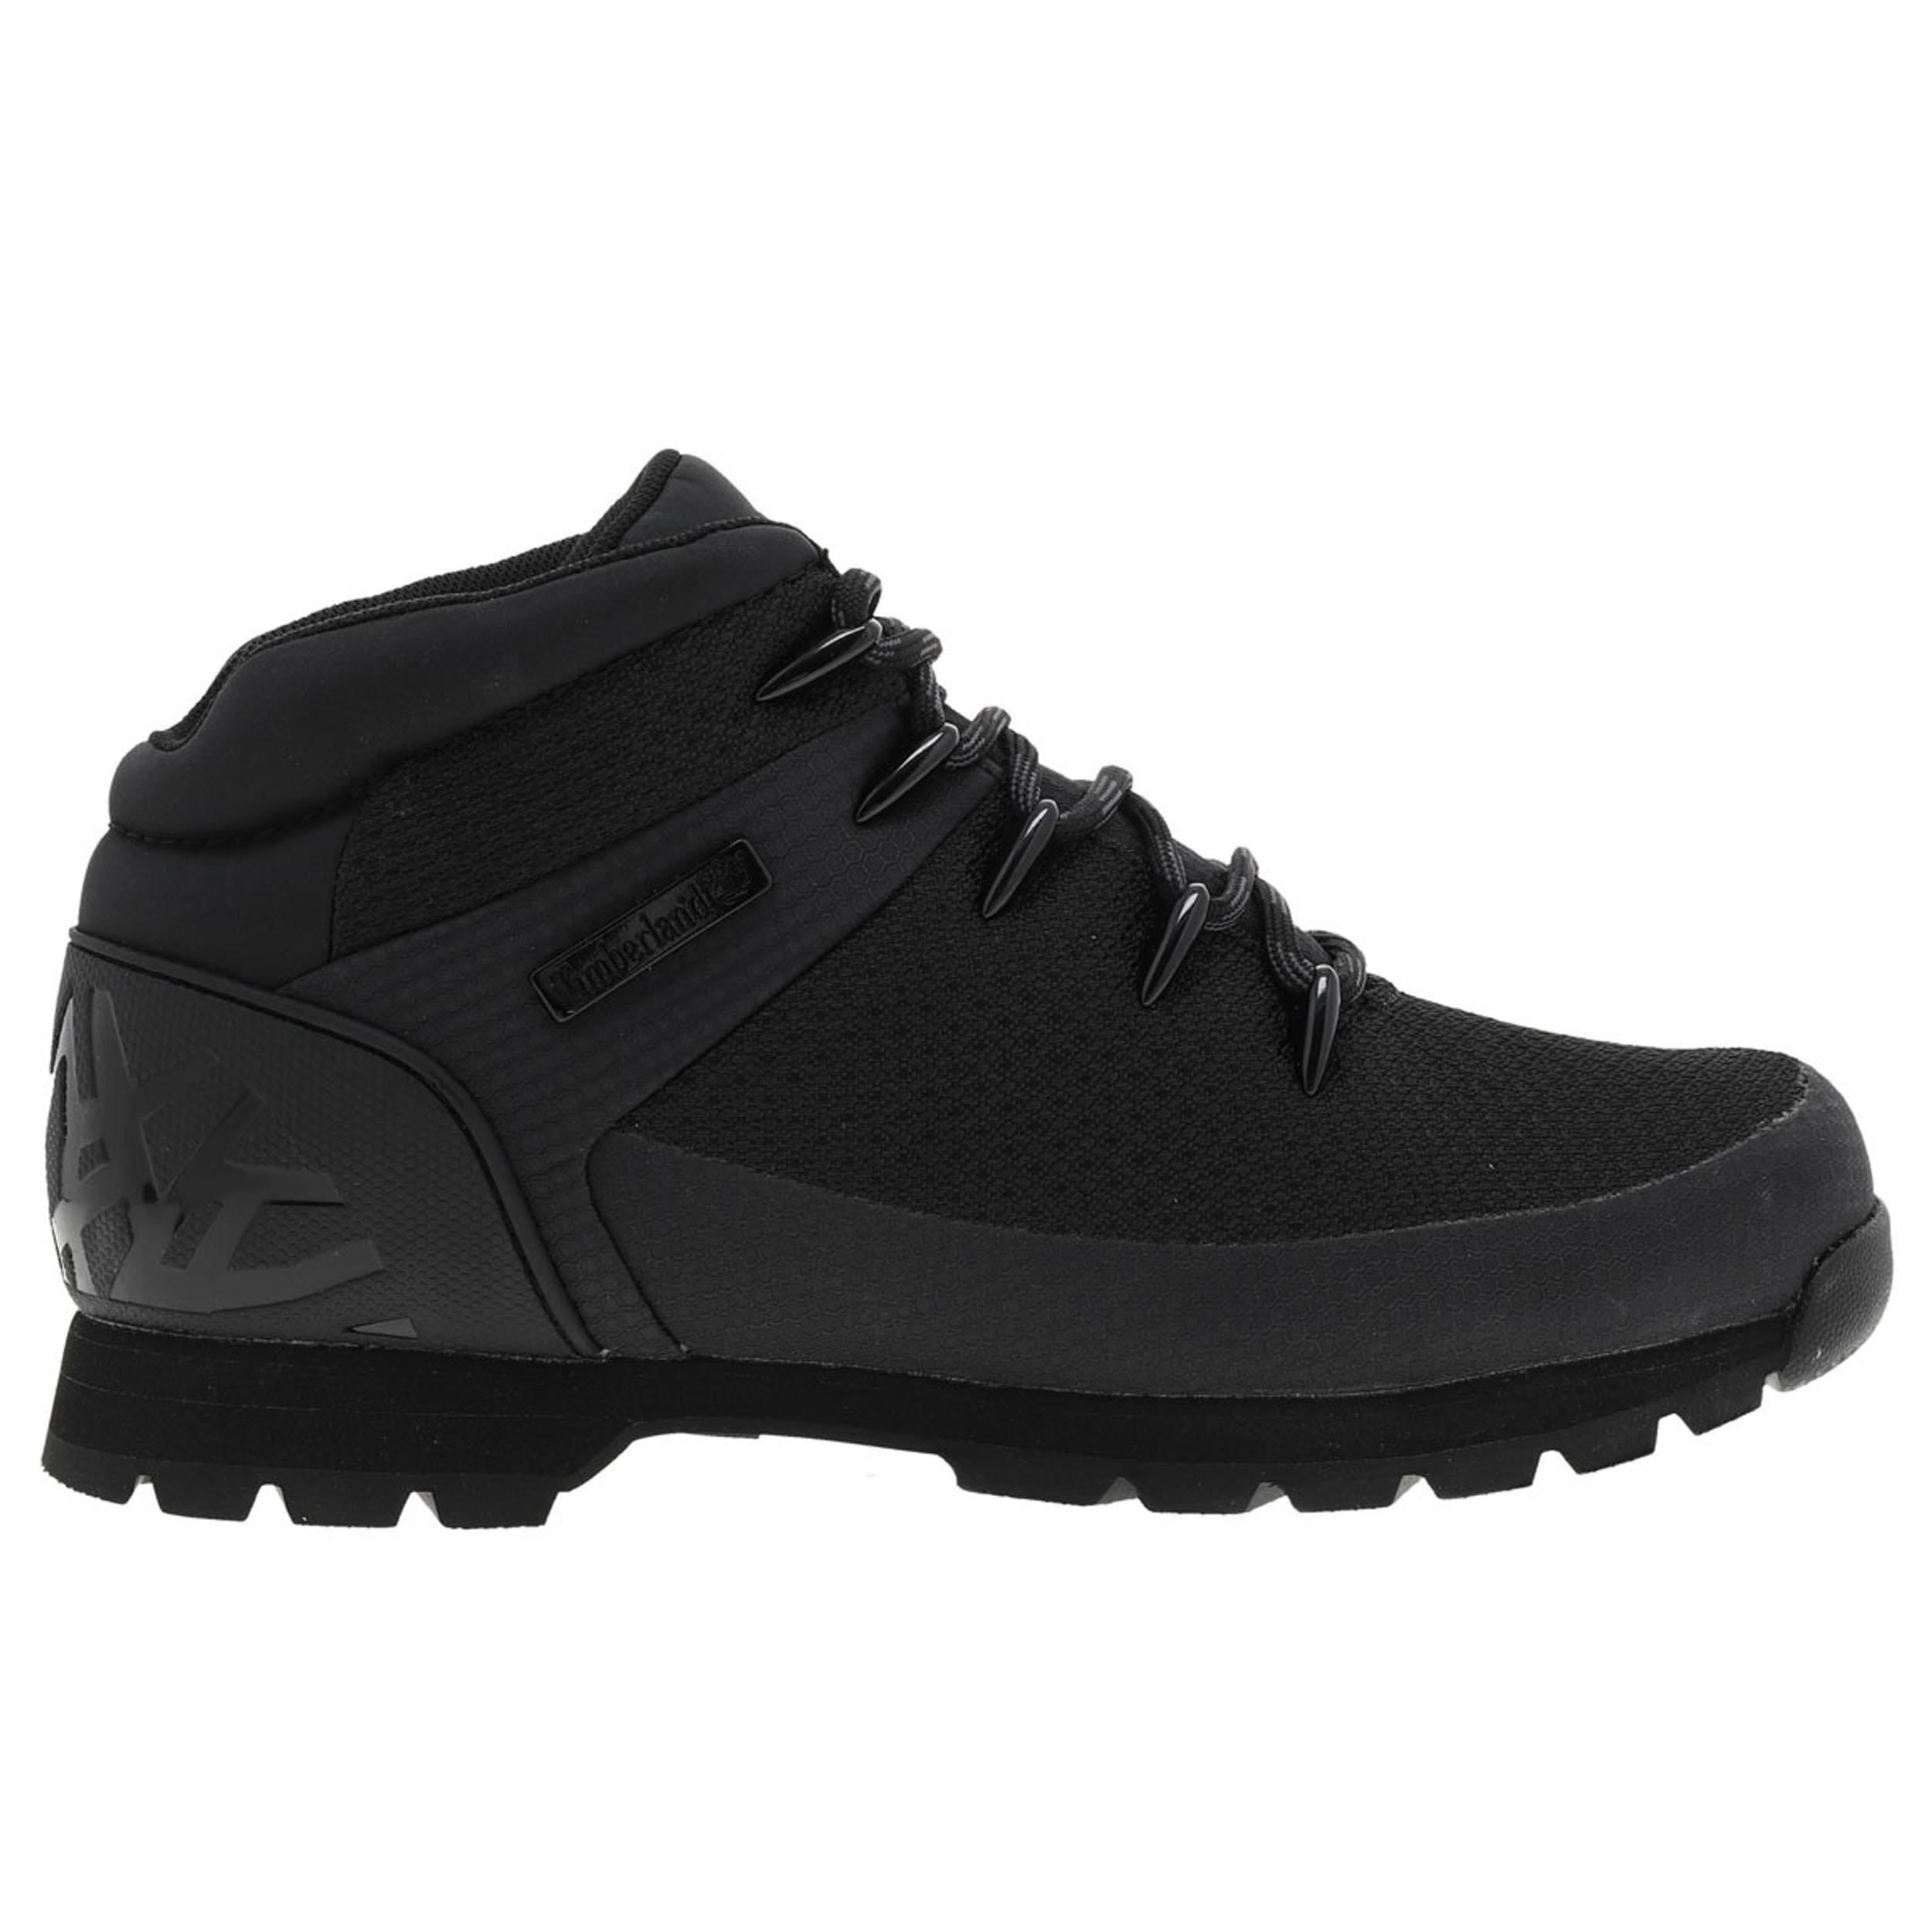 Chaussures montantes  euro sprint waterproof en toile noire